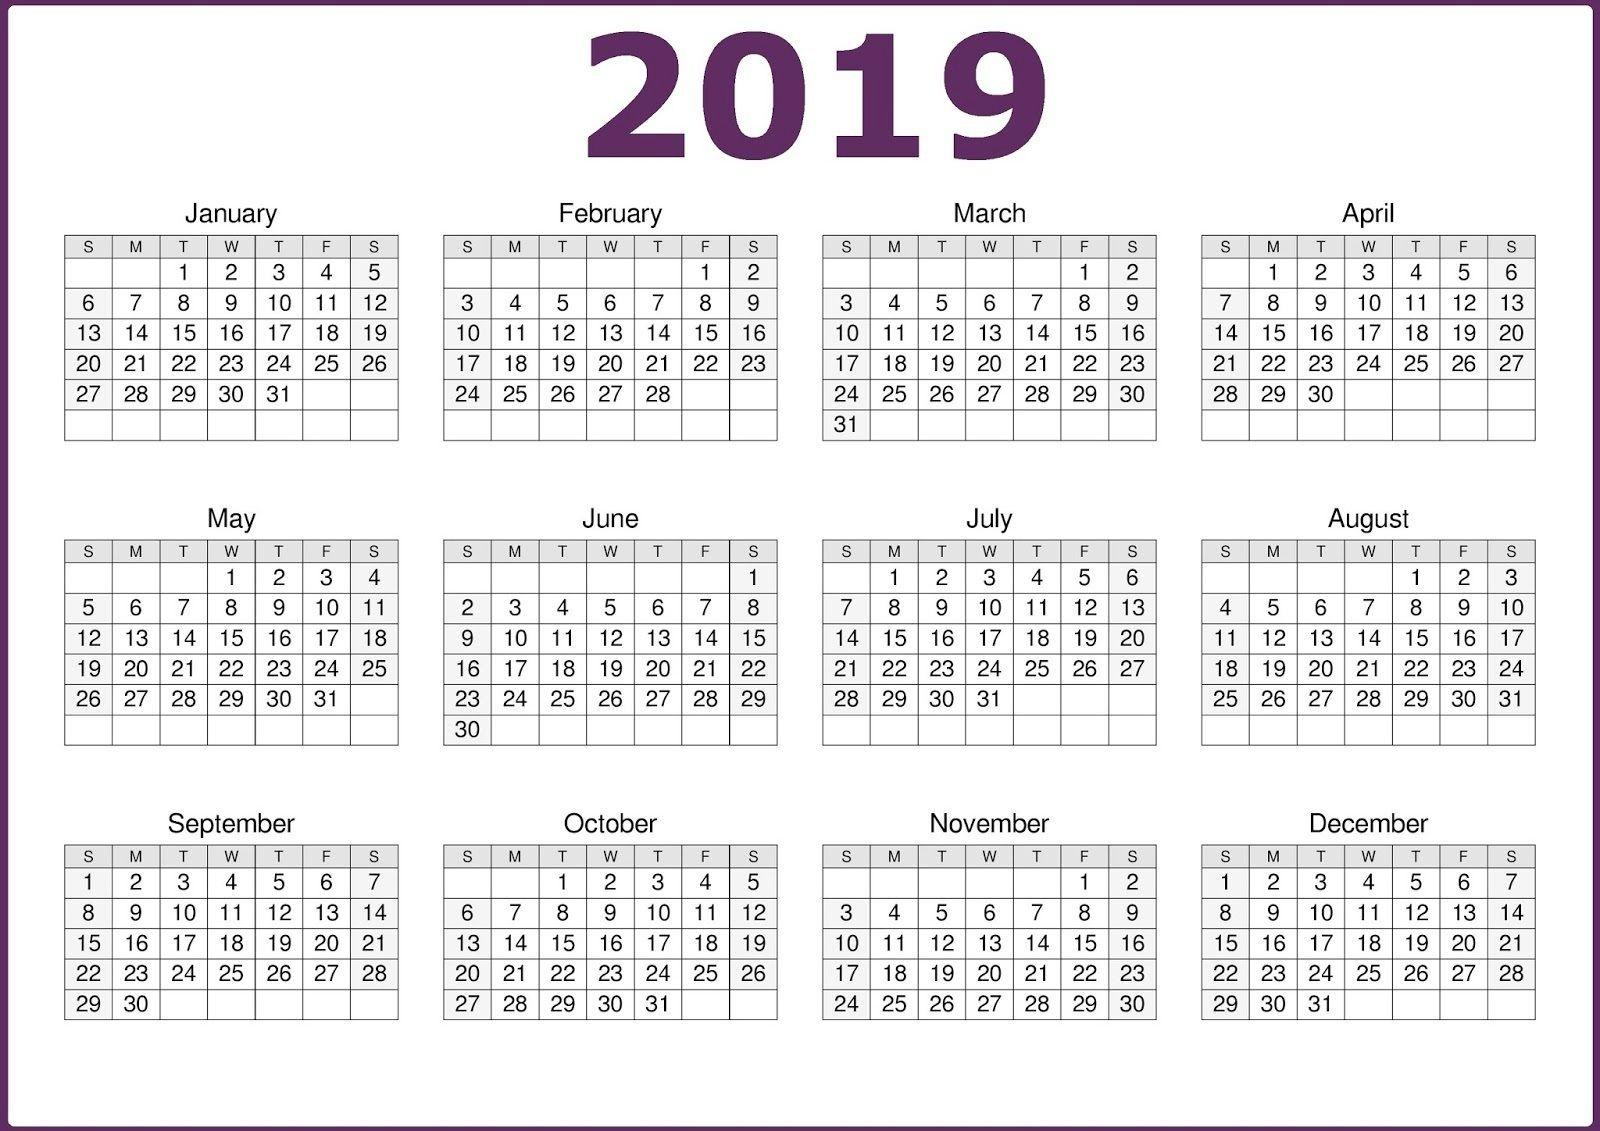 Microsoft Calendar Template 2019 Download | Top 10 Free 2019 with regard to Monthly Calendar Templates 12 Months